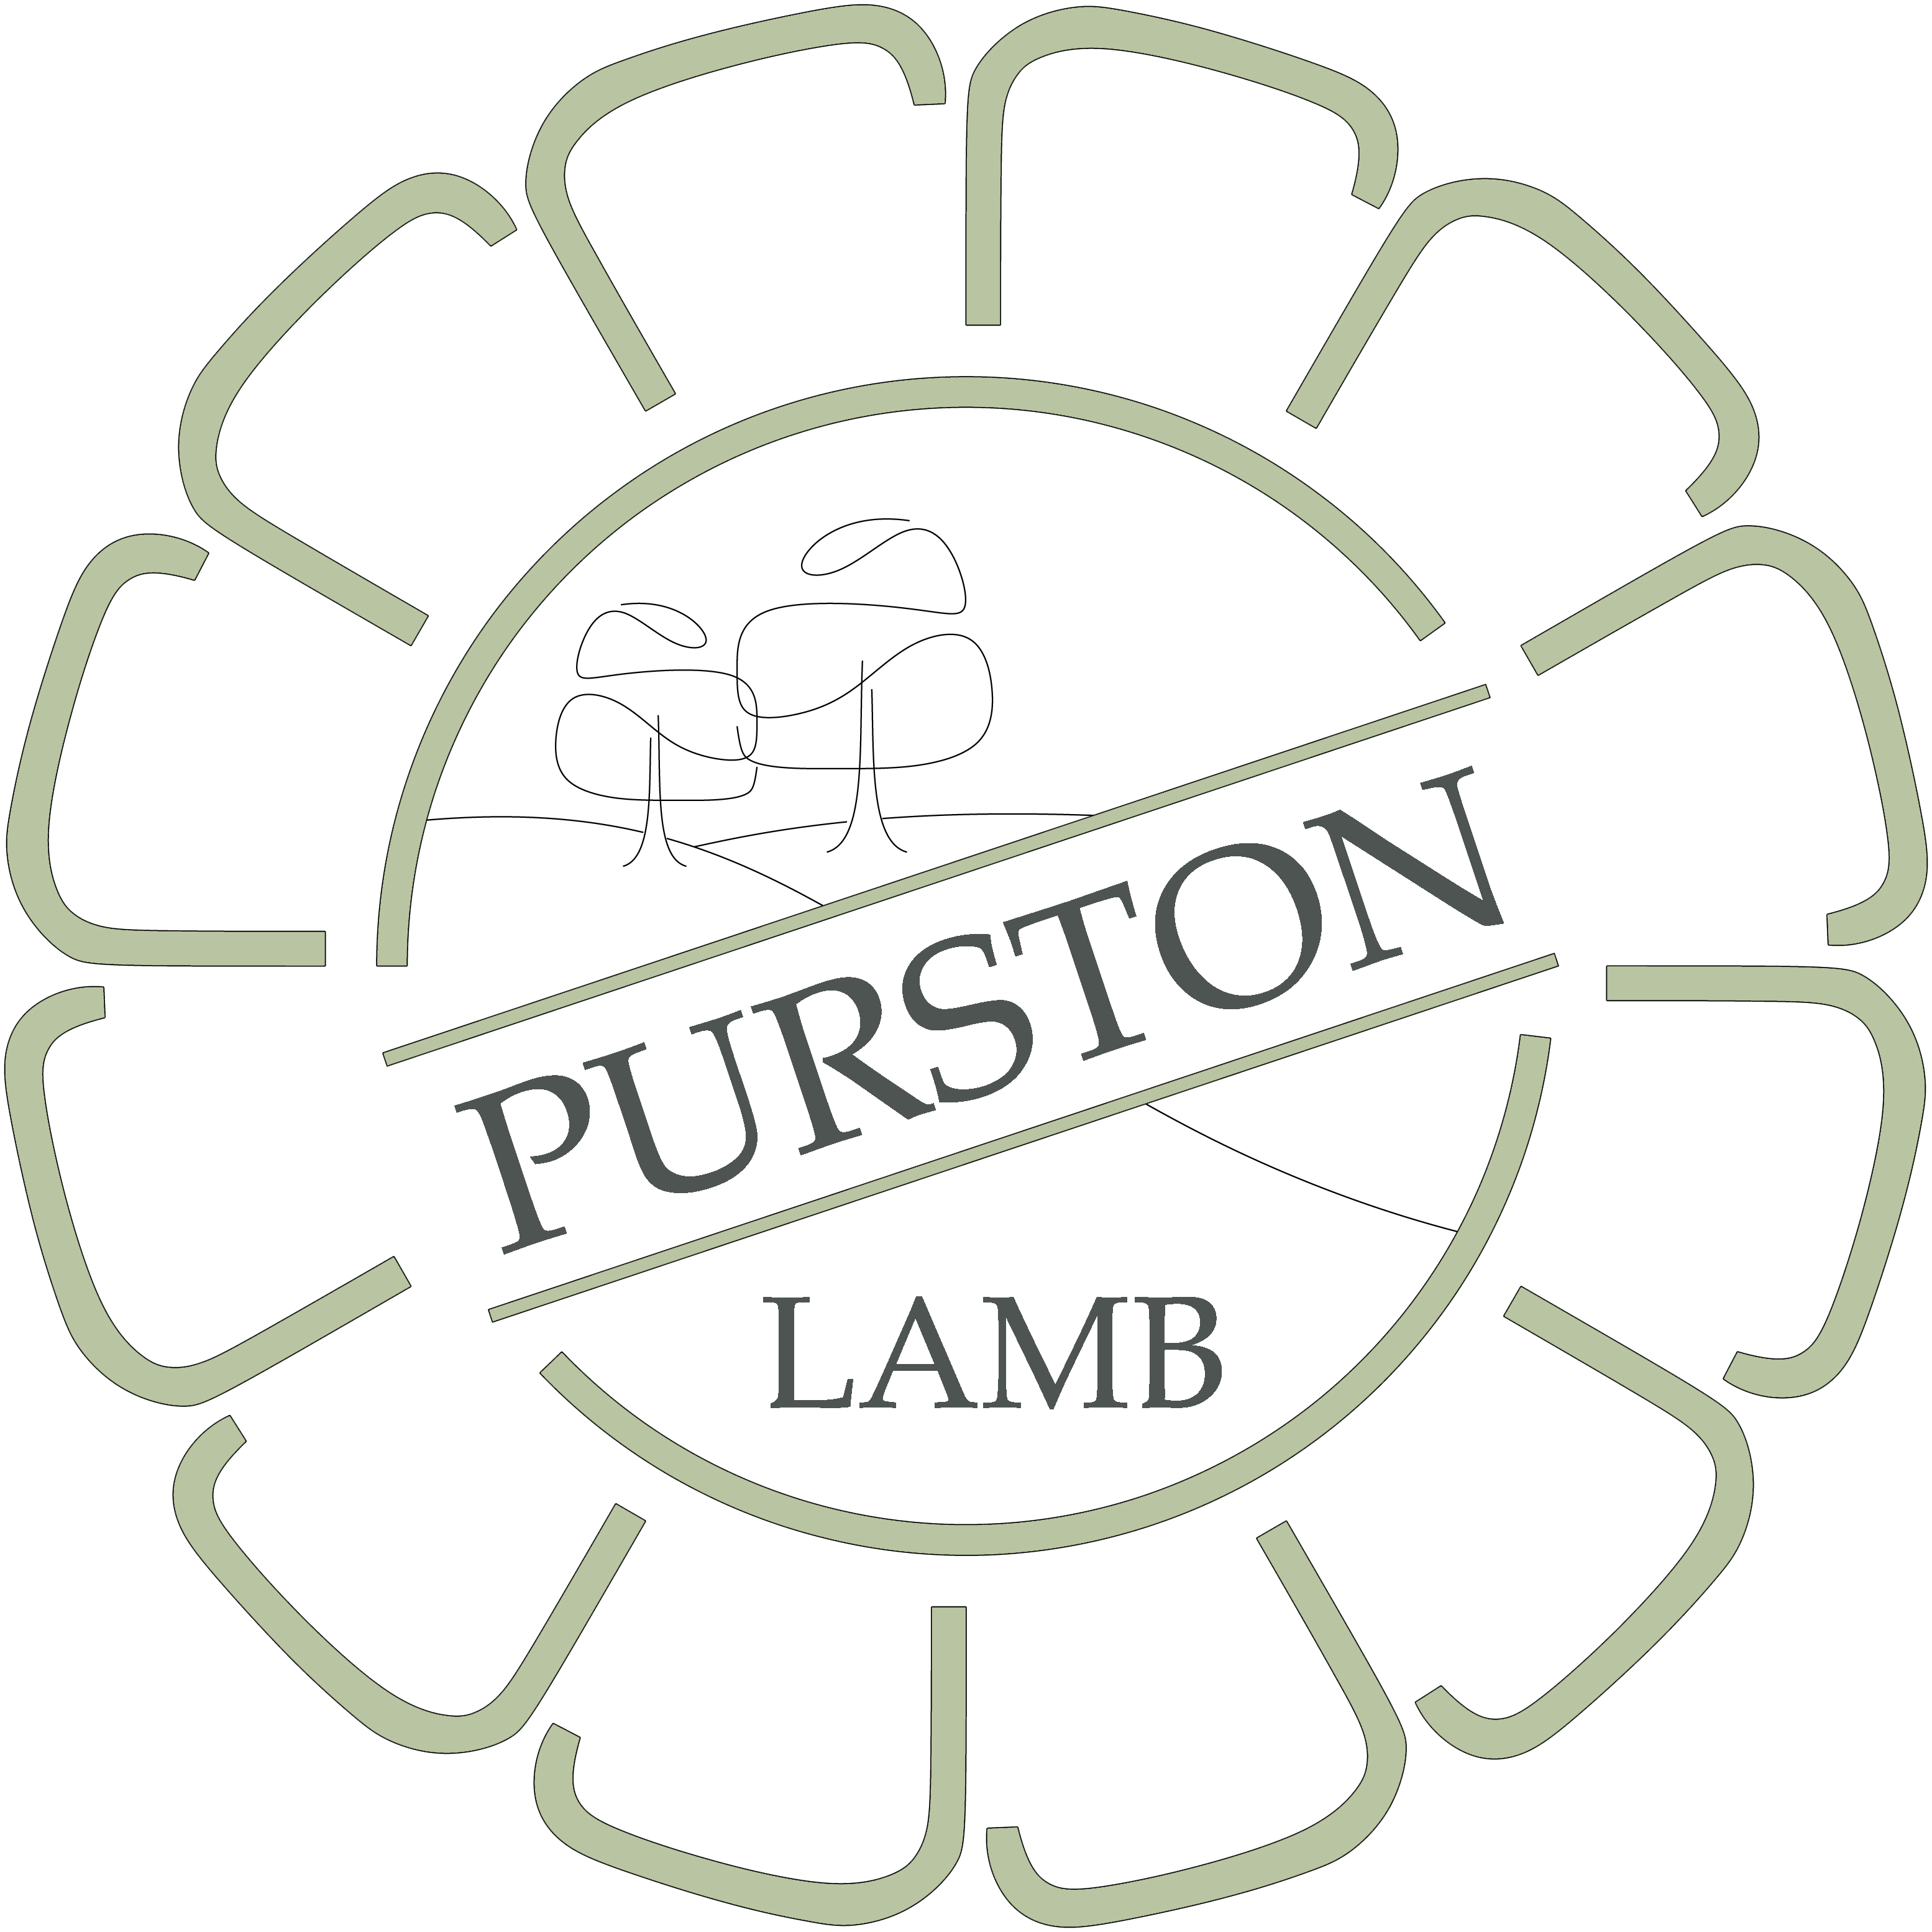 Purston Lamb